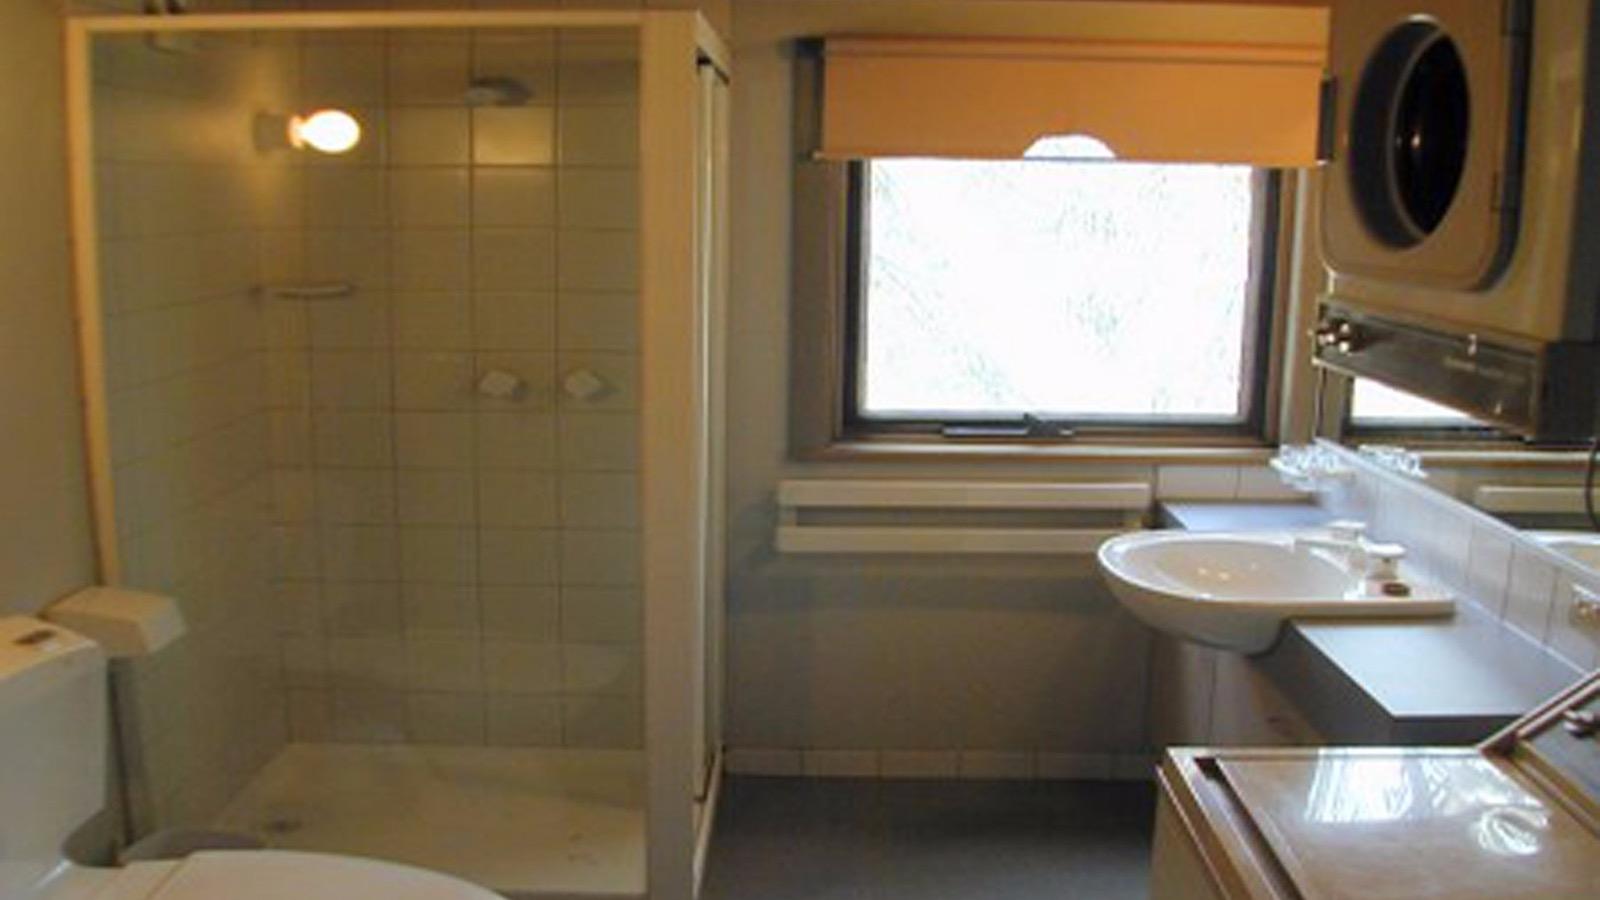 Shower, basin, washer & dryer